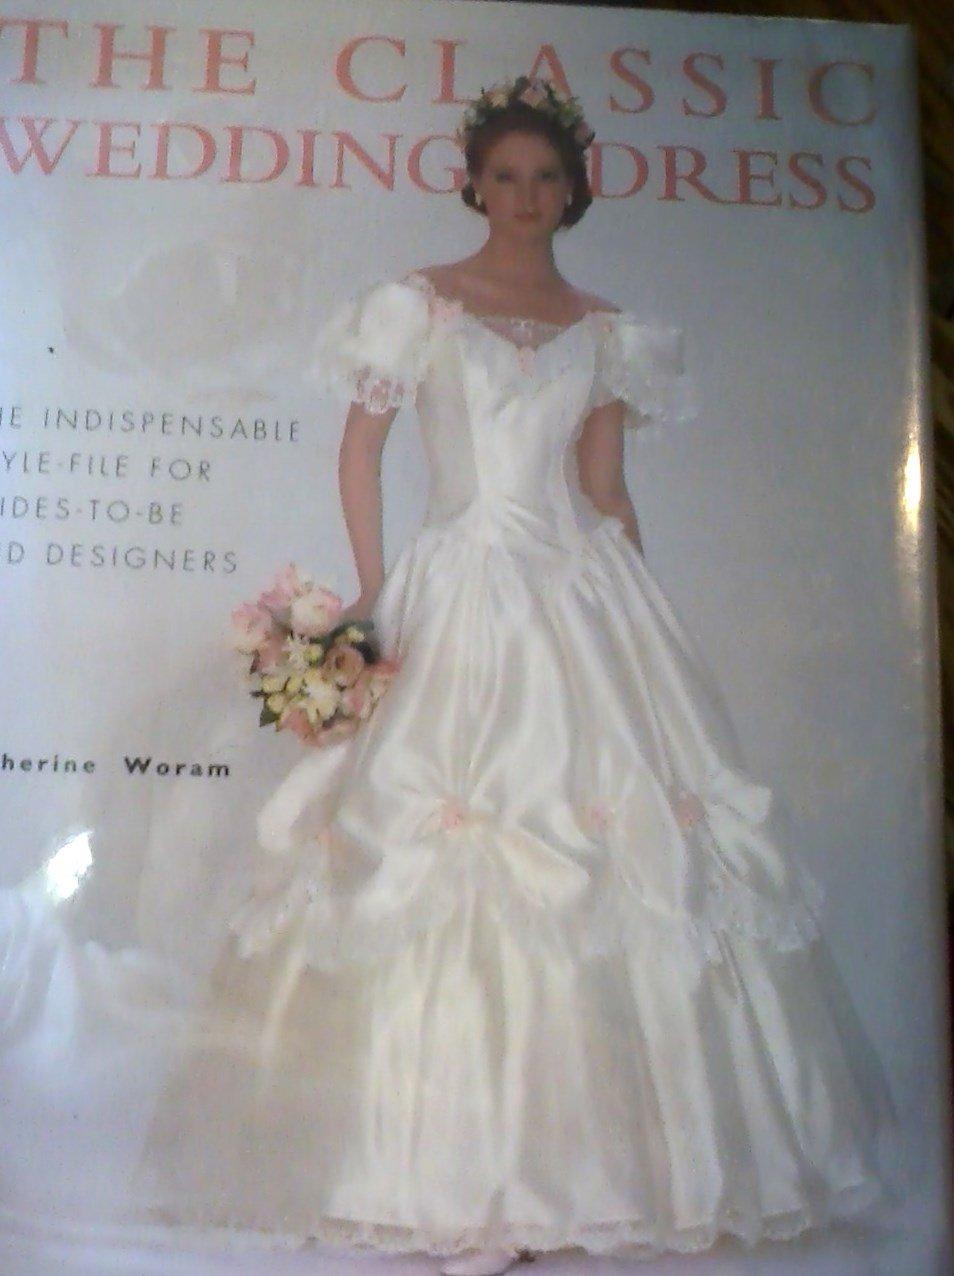 The Classic Wedding Dress: Catherine Woram: 9781555219680: Amazon ...